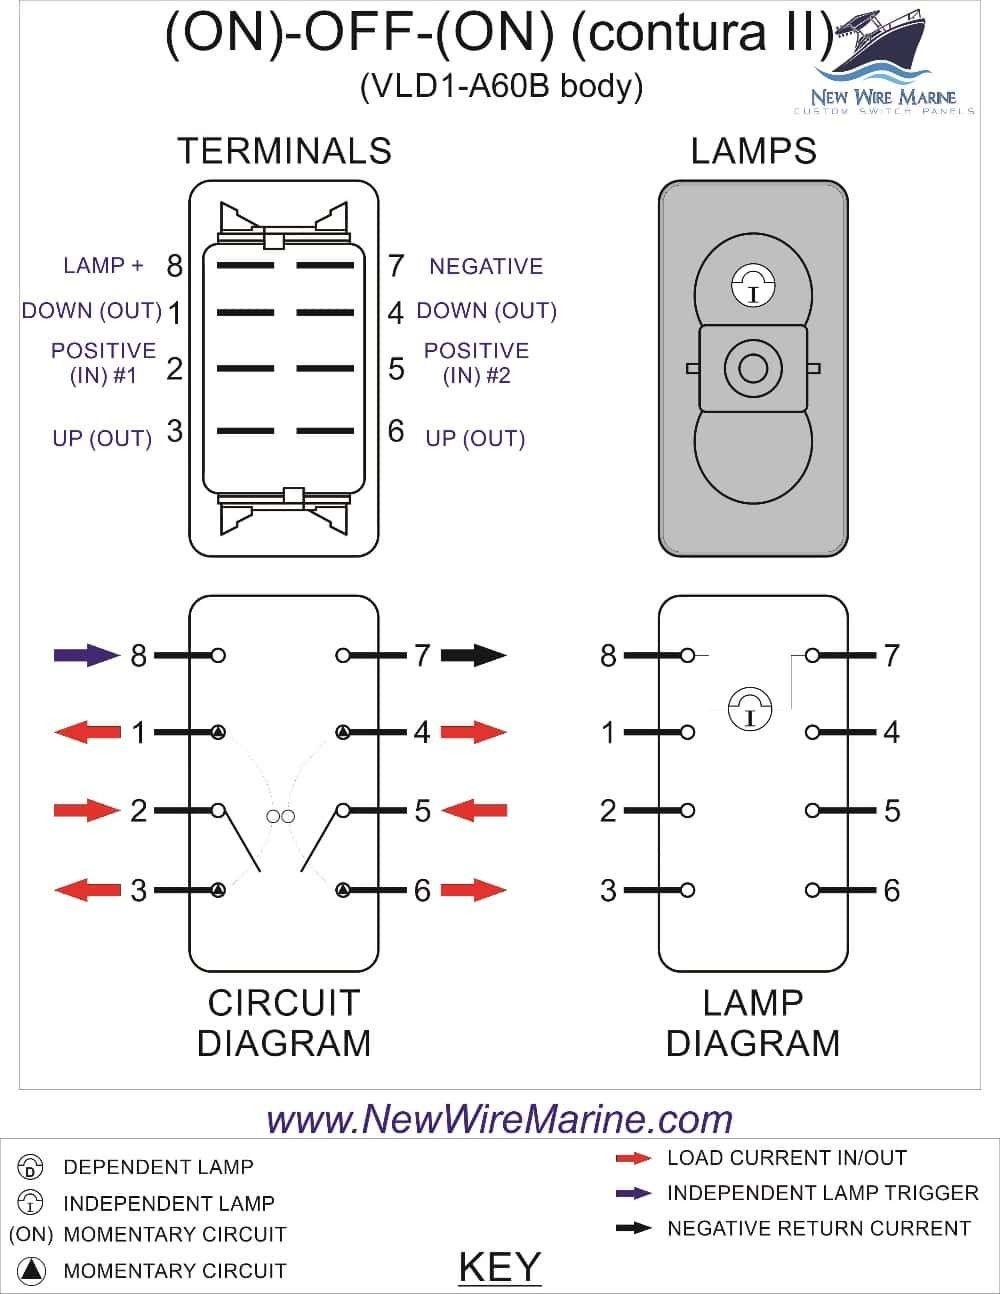 Elegant Winch Switch Wiring Diagram In 2020 Wire Diagram Relay